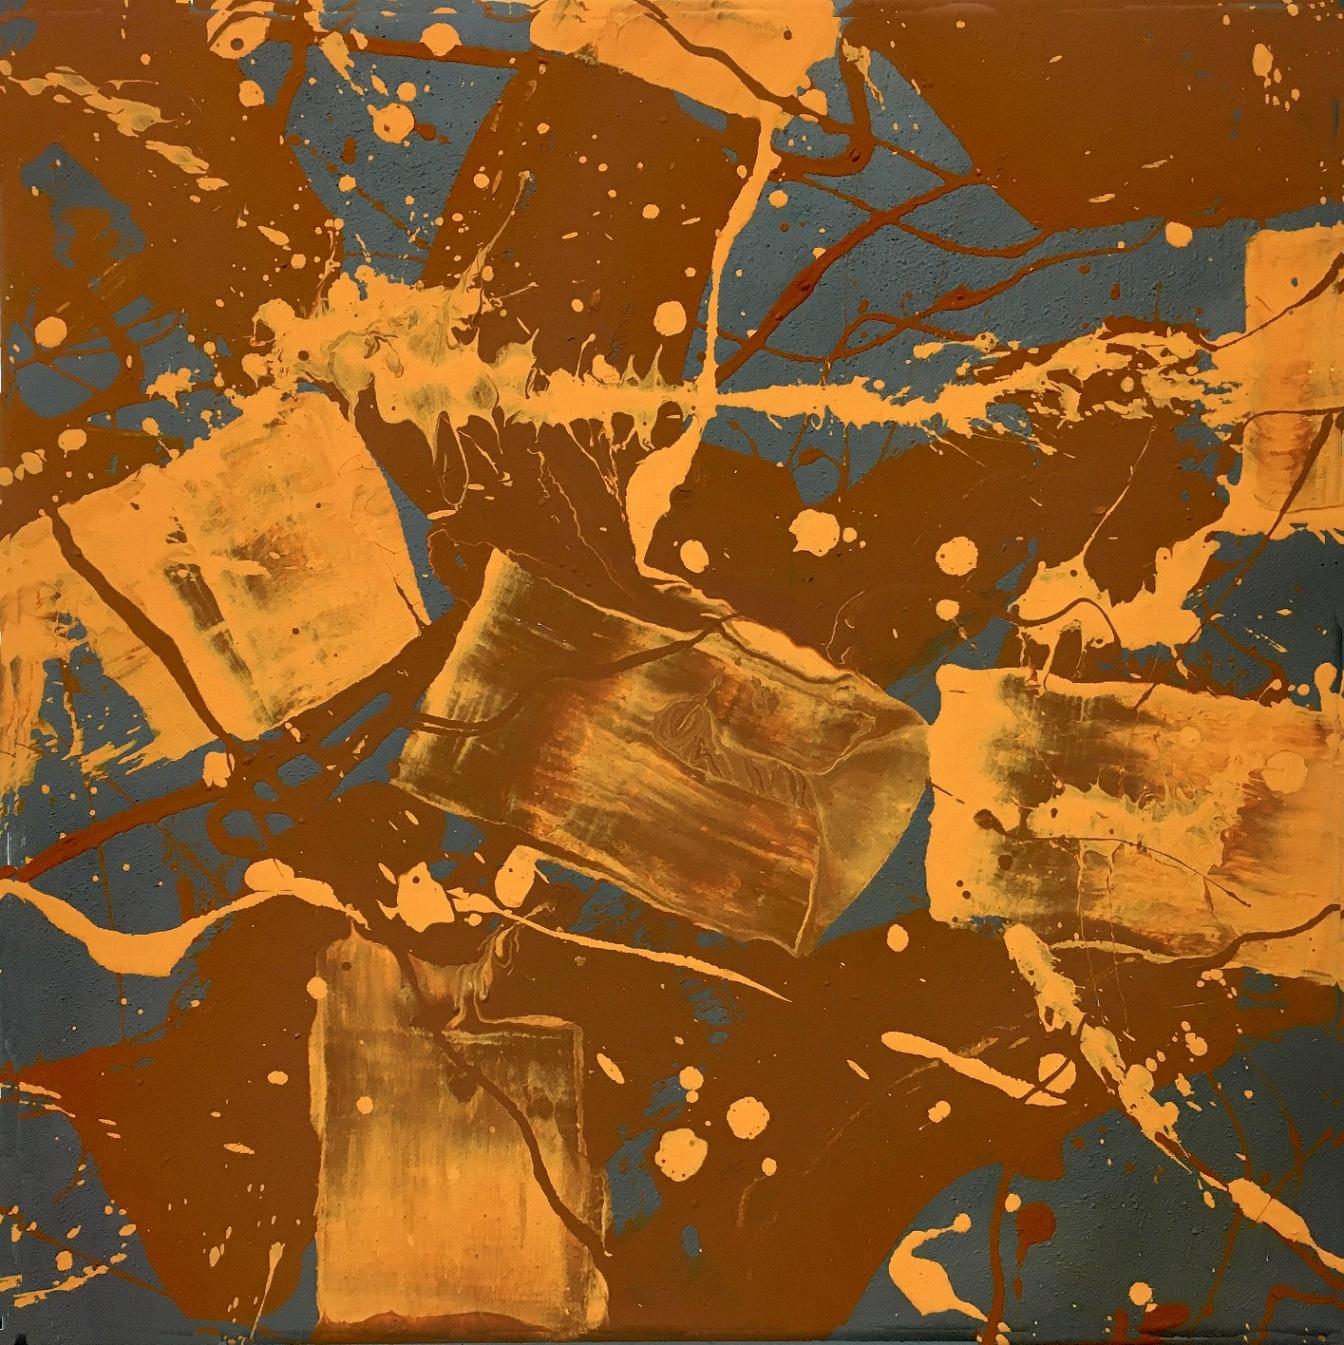 Grau Gelb 1 40 x 40 cm